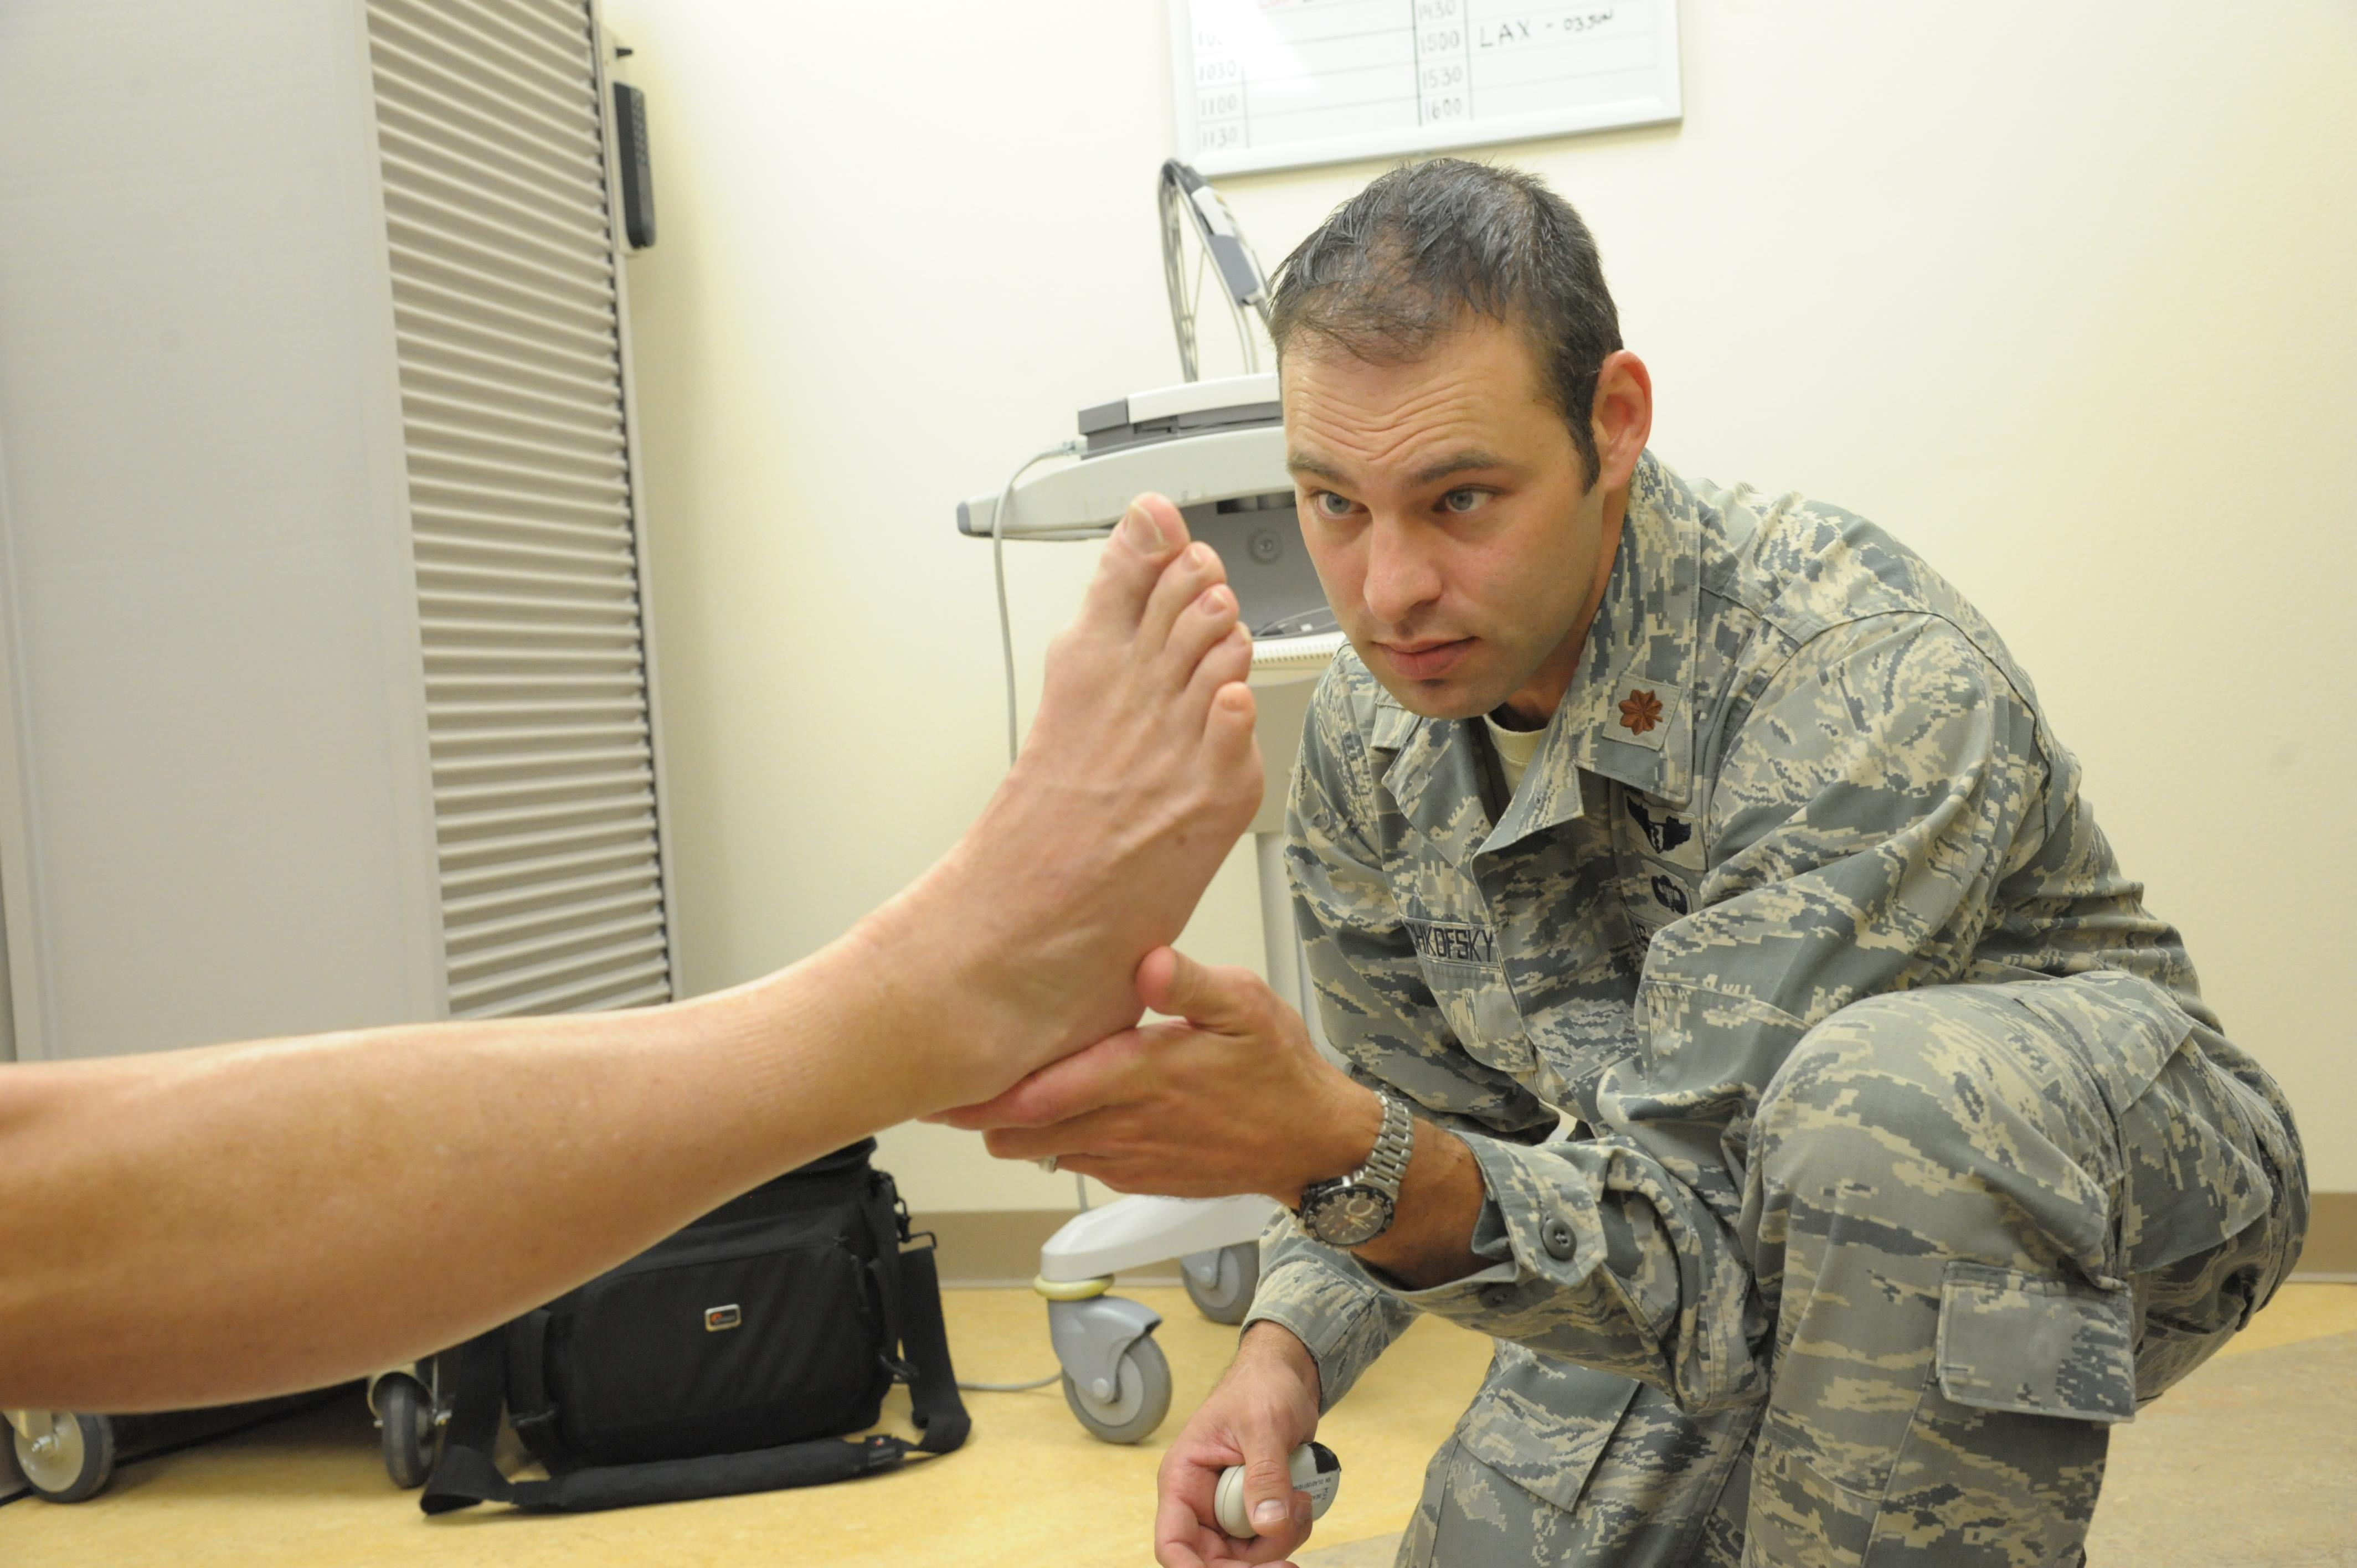 Dermatology Services Added To Jbsa Randolph Medical Clinic